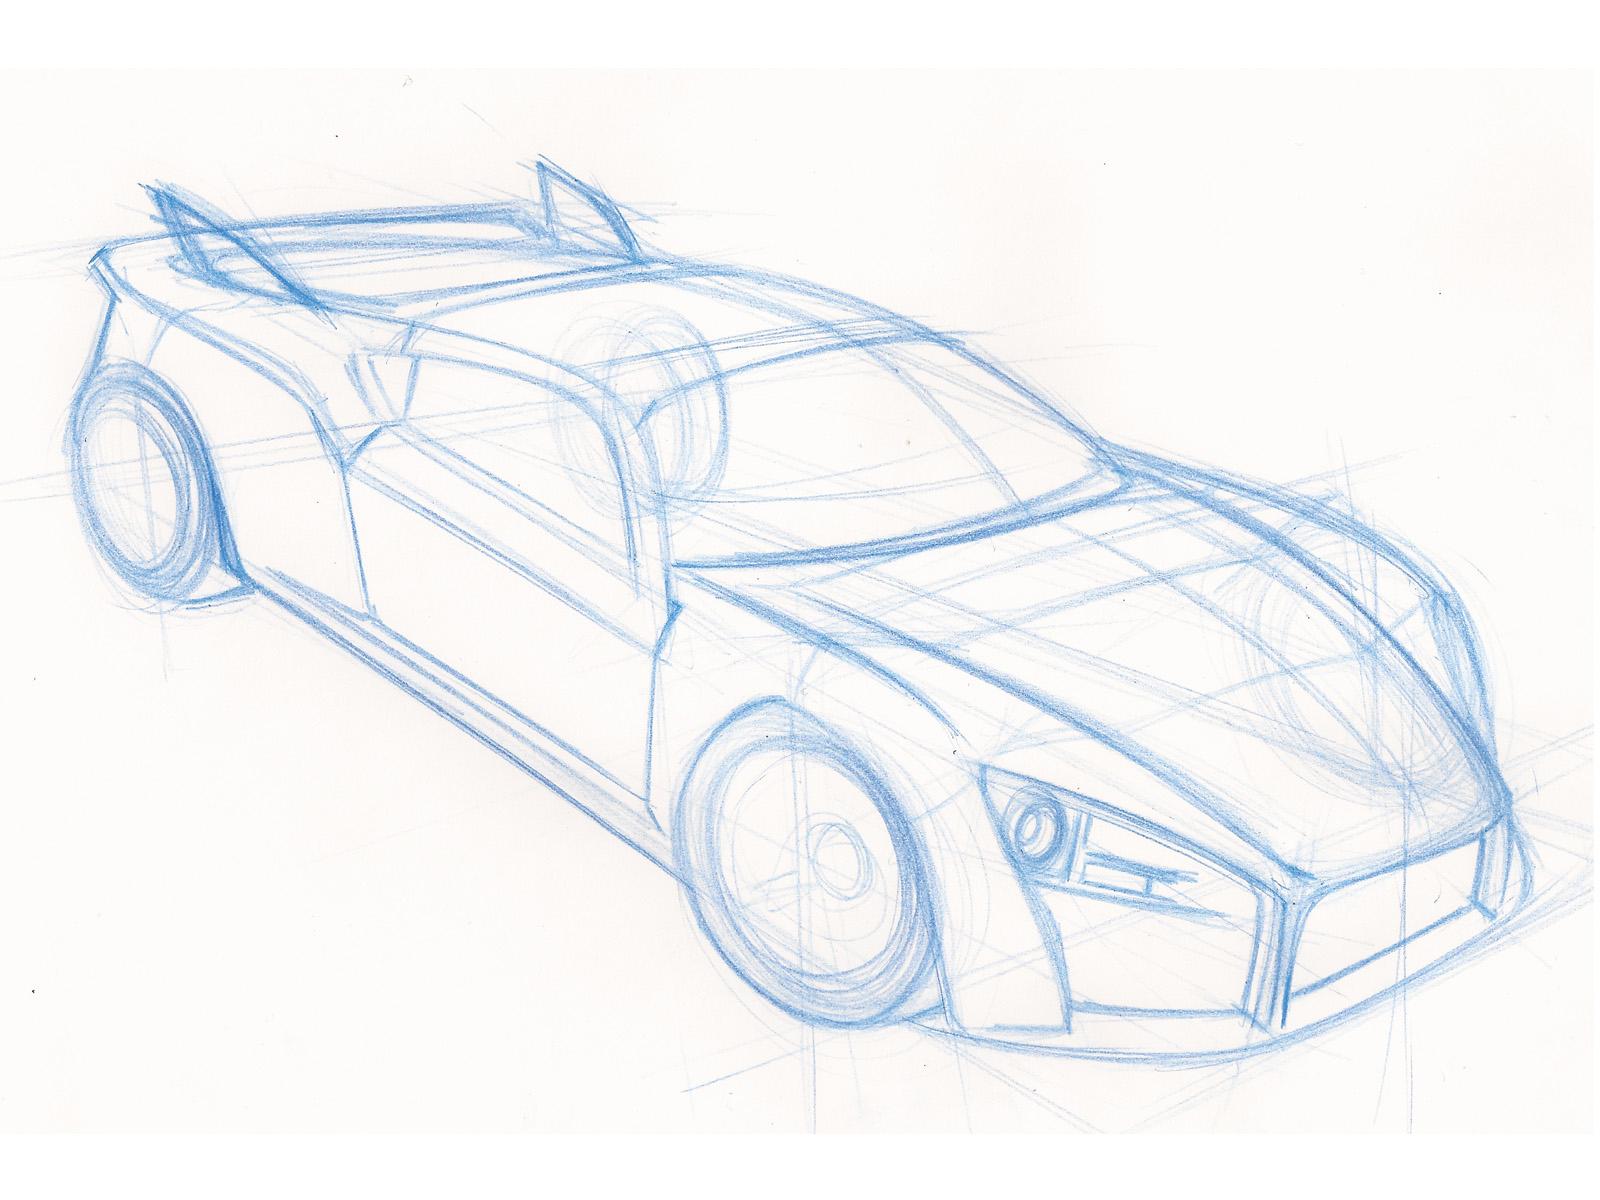 1600x1200 Drawings Of Cars In Pencil Easy Cars Easy Pencil Drawings Car